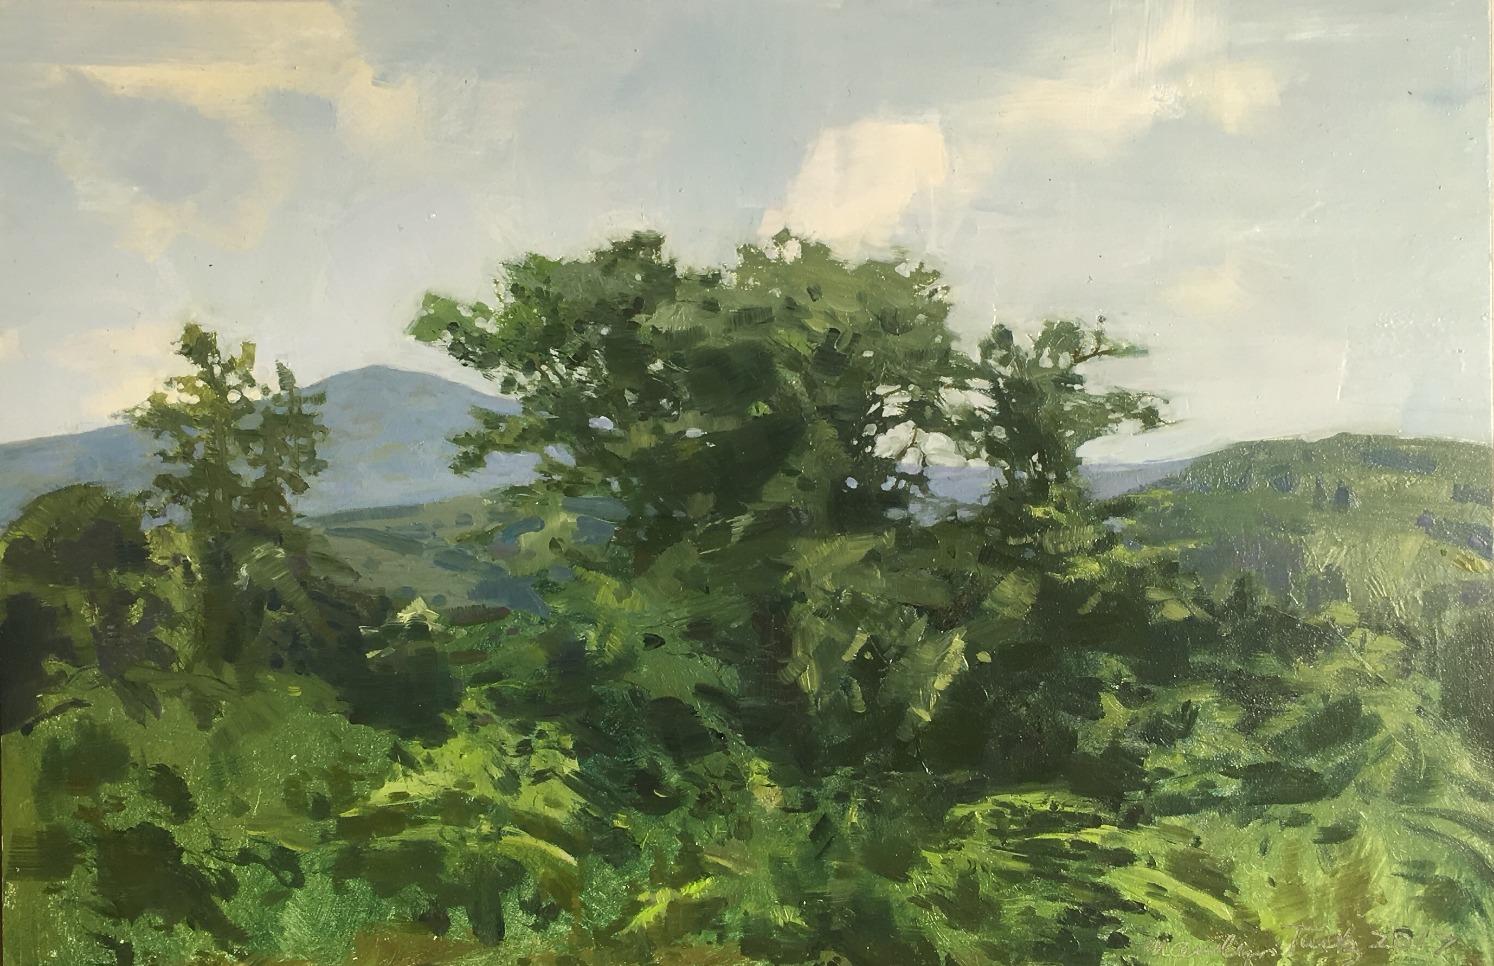 Mount Ascutney